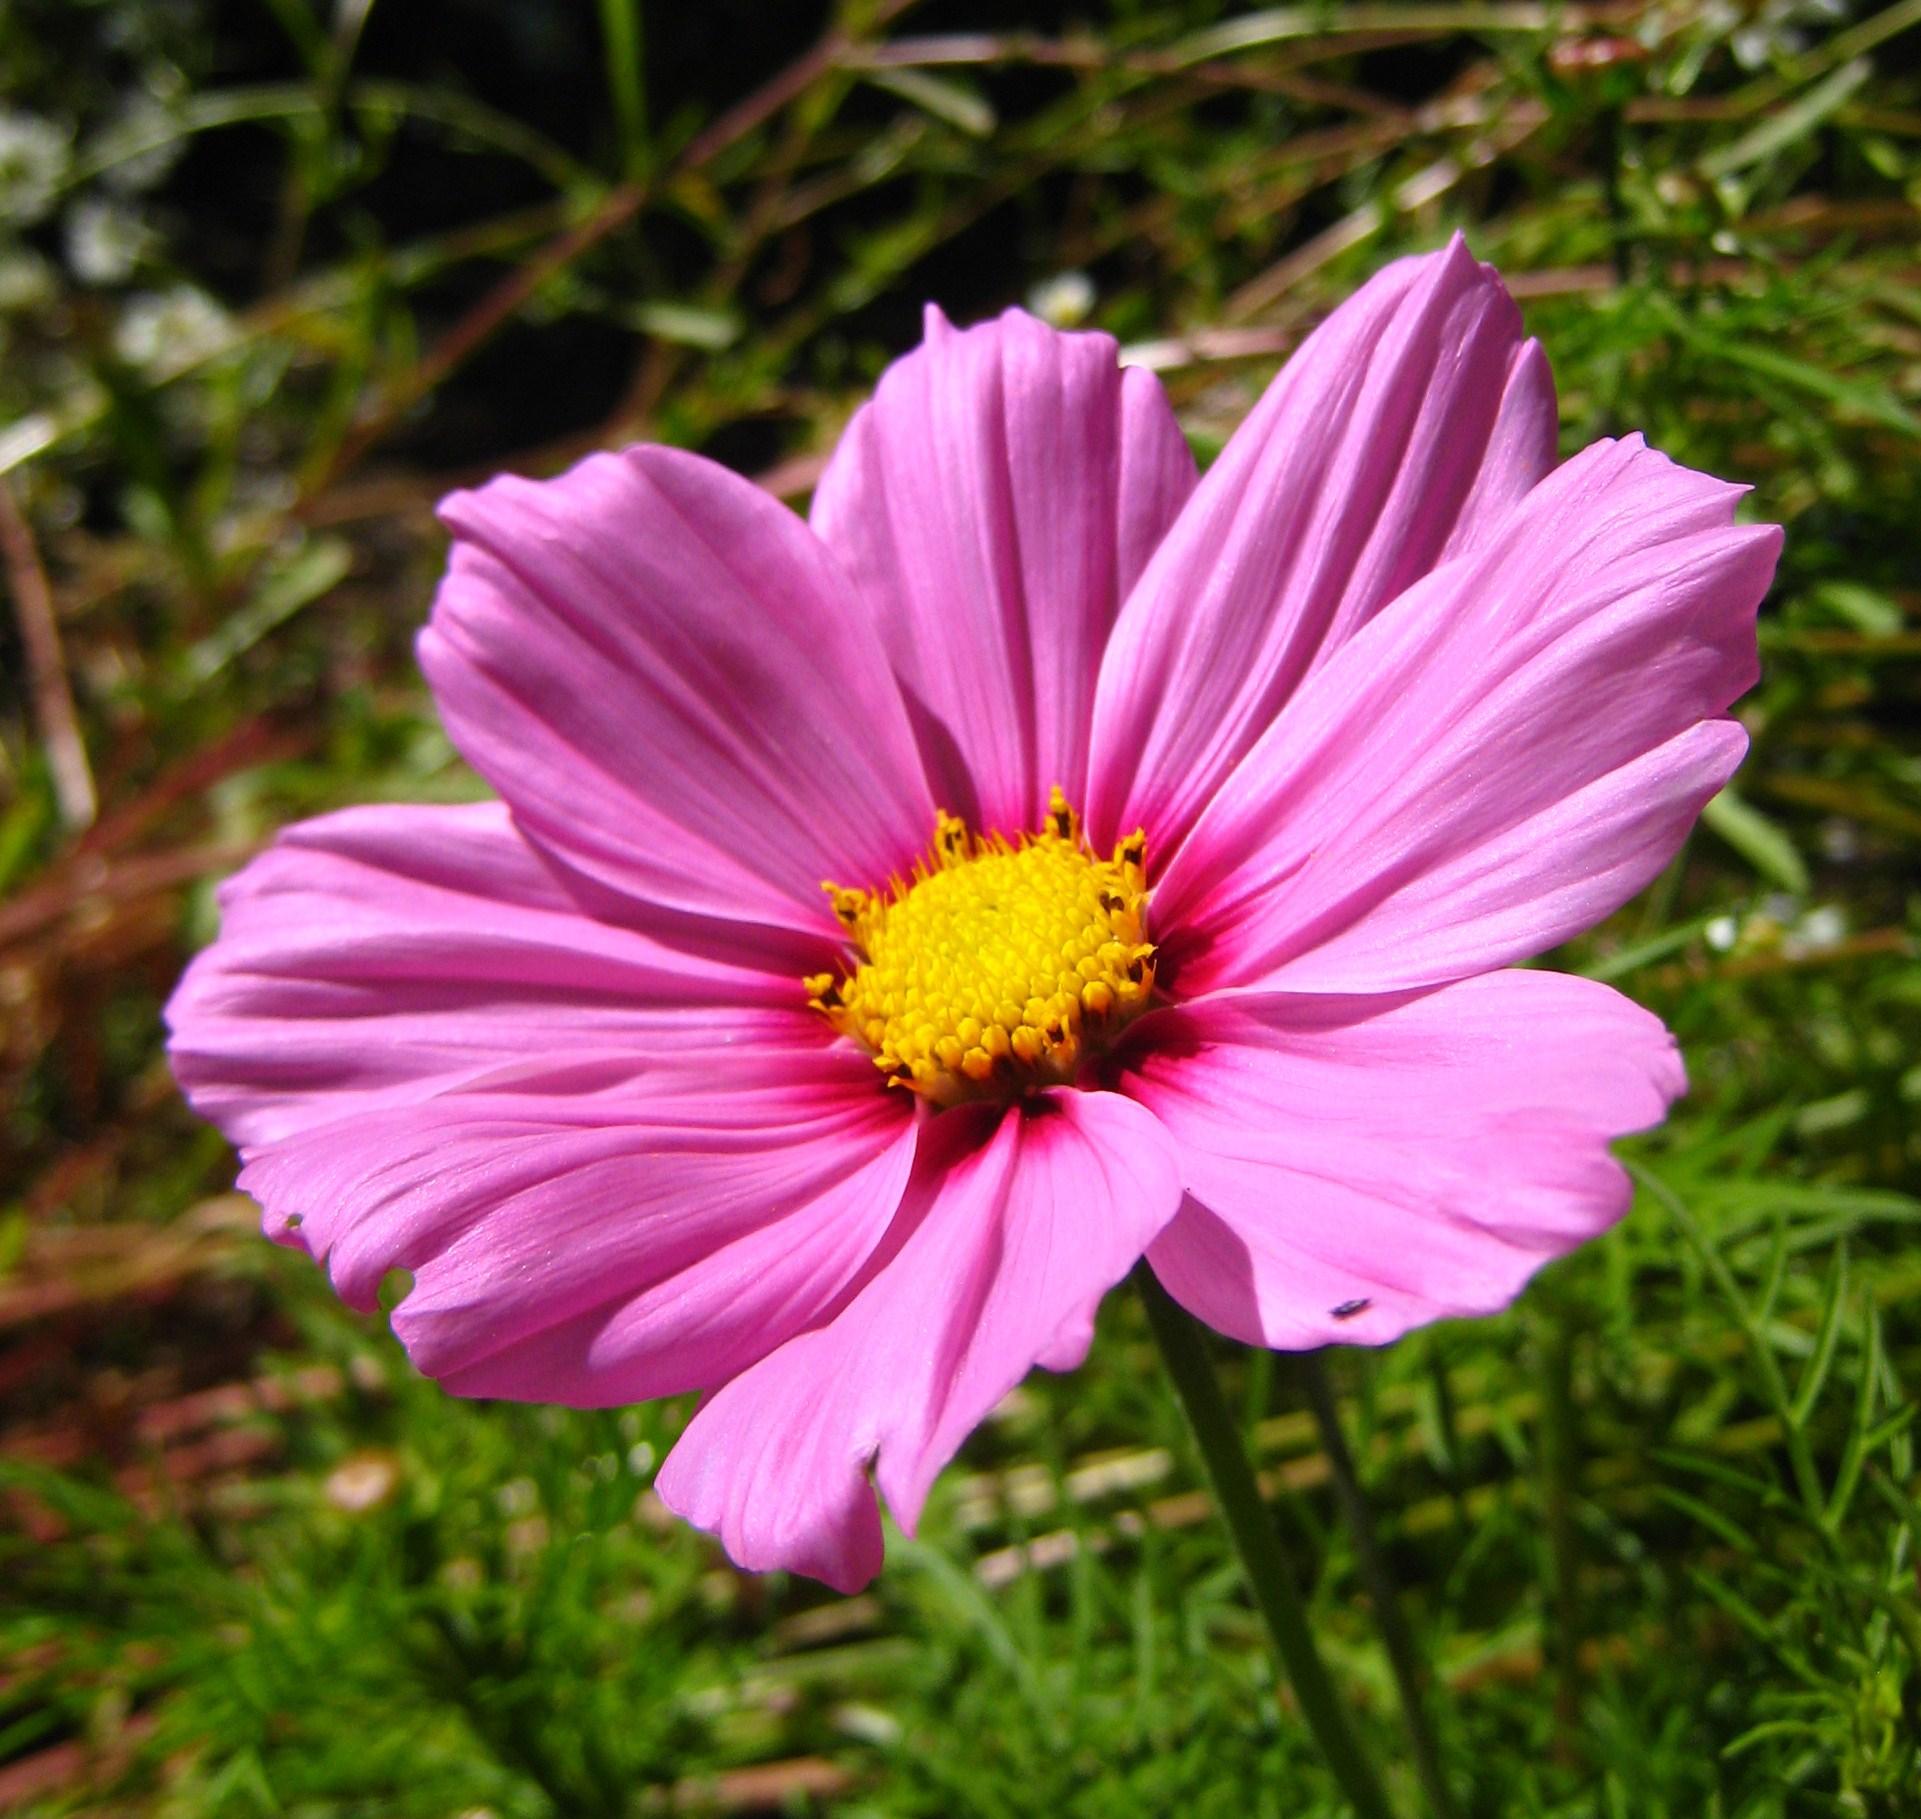 Pink flower background 1377212 - Description Pink Flower 02 Orcas Jpg